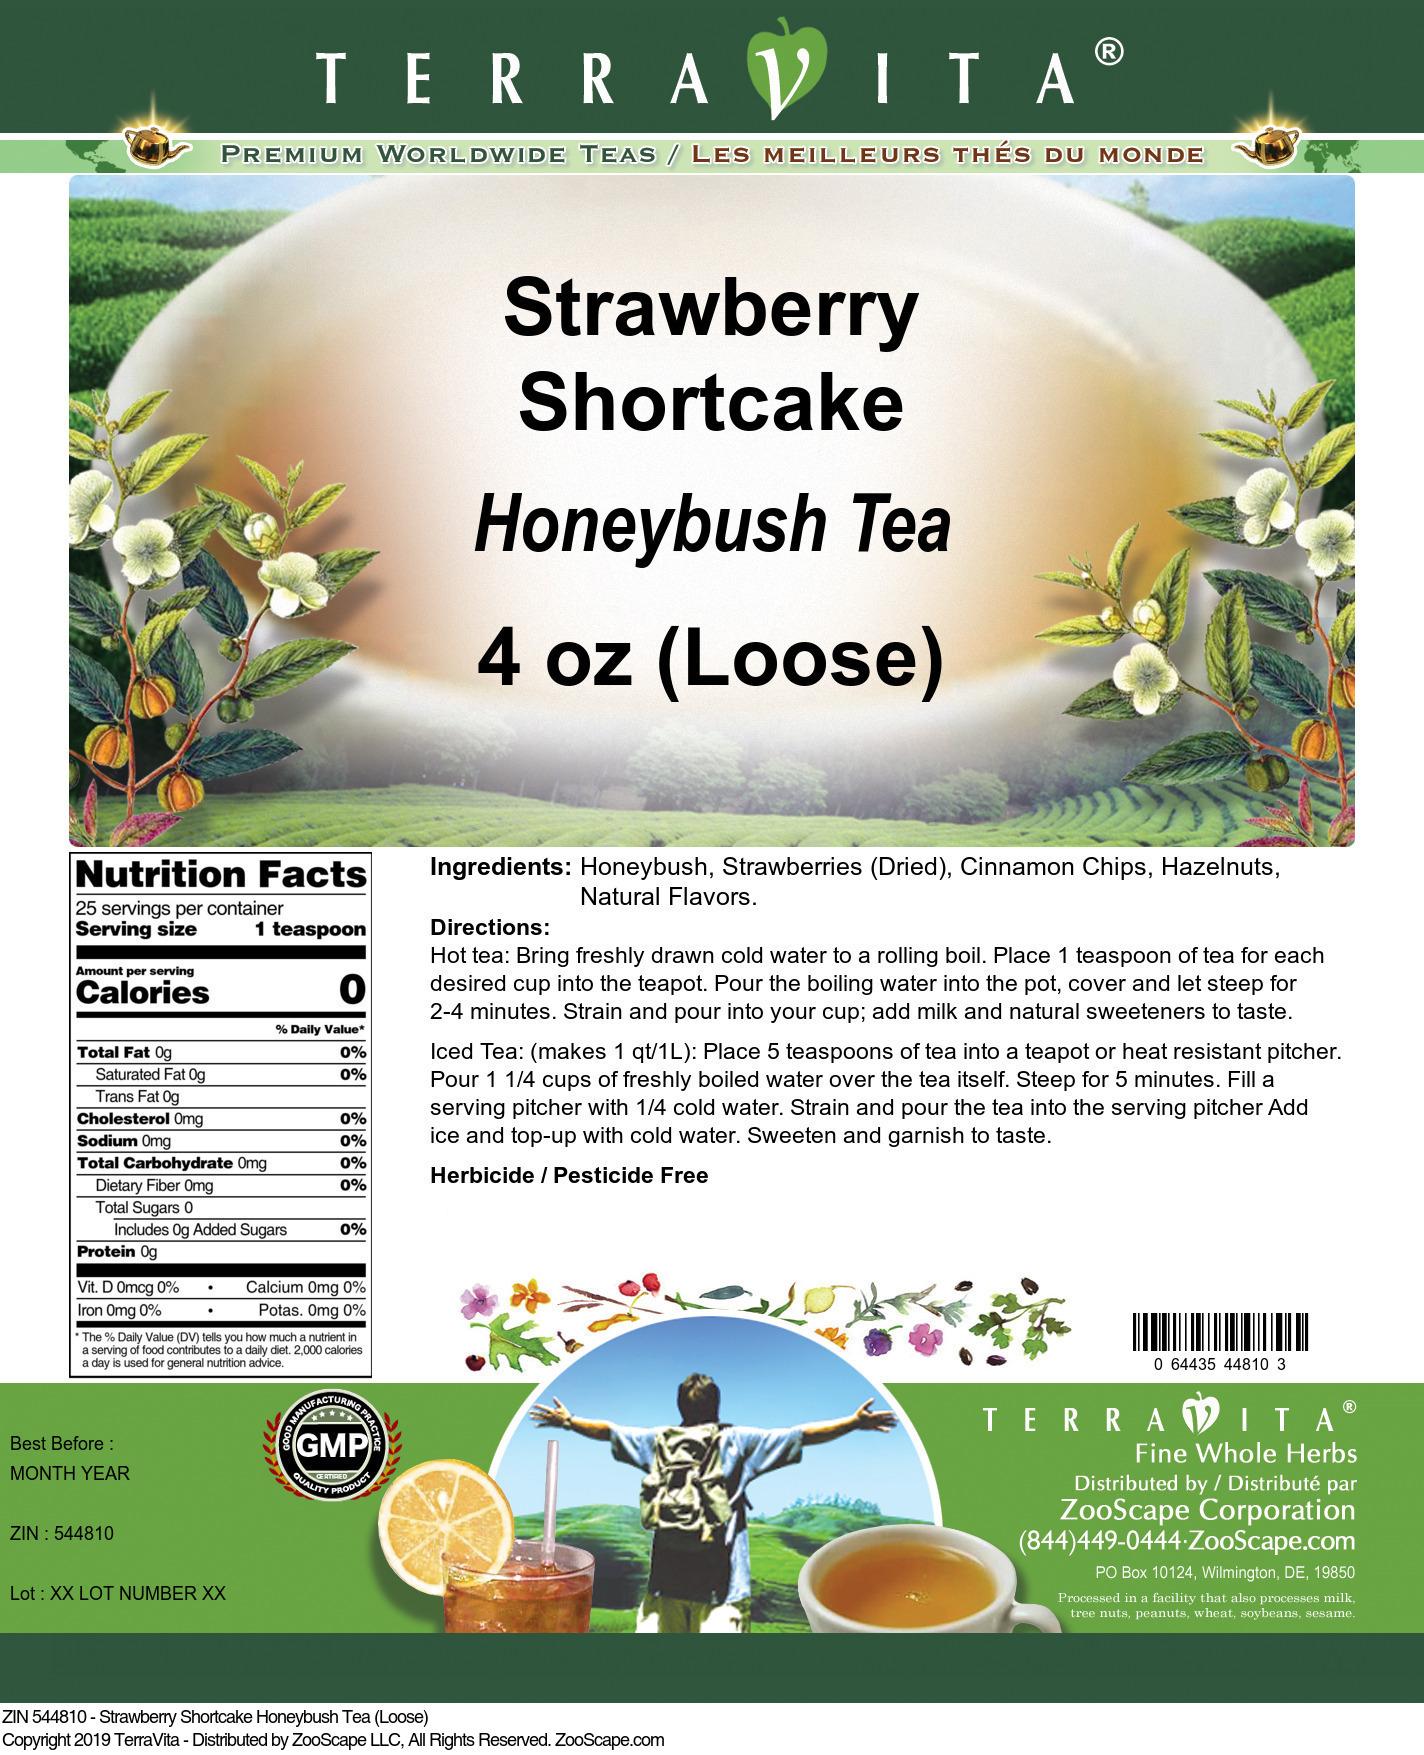 Strawberry Shortcake Honeybush Tea (Loose)